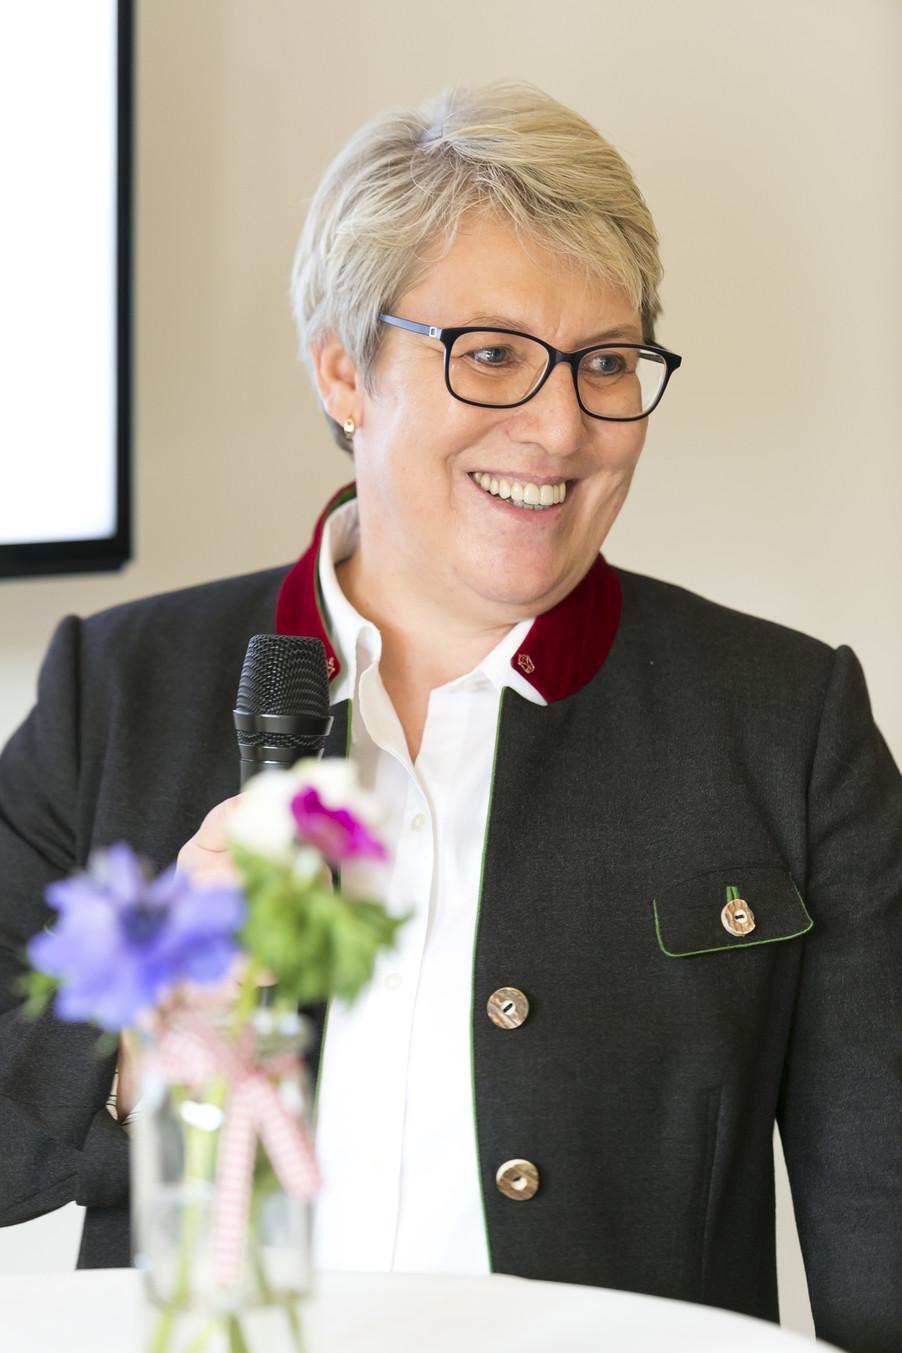 Bild 30   Löwen Hotel Montafon eröffnet neues Teamhaus